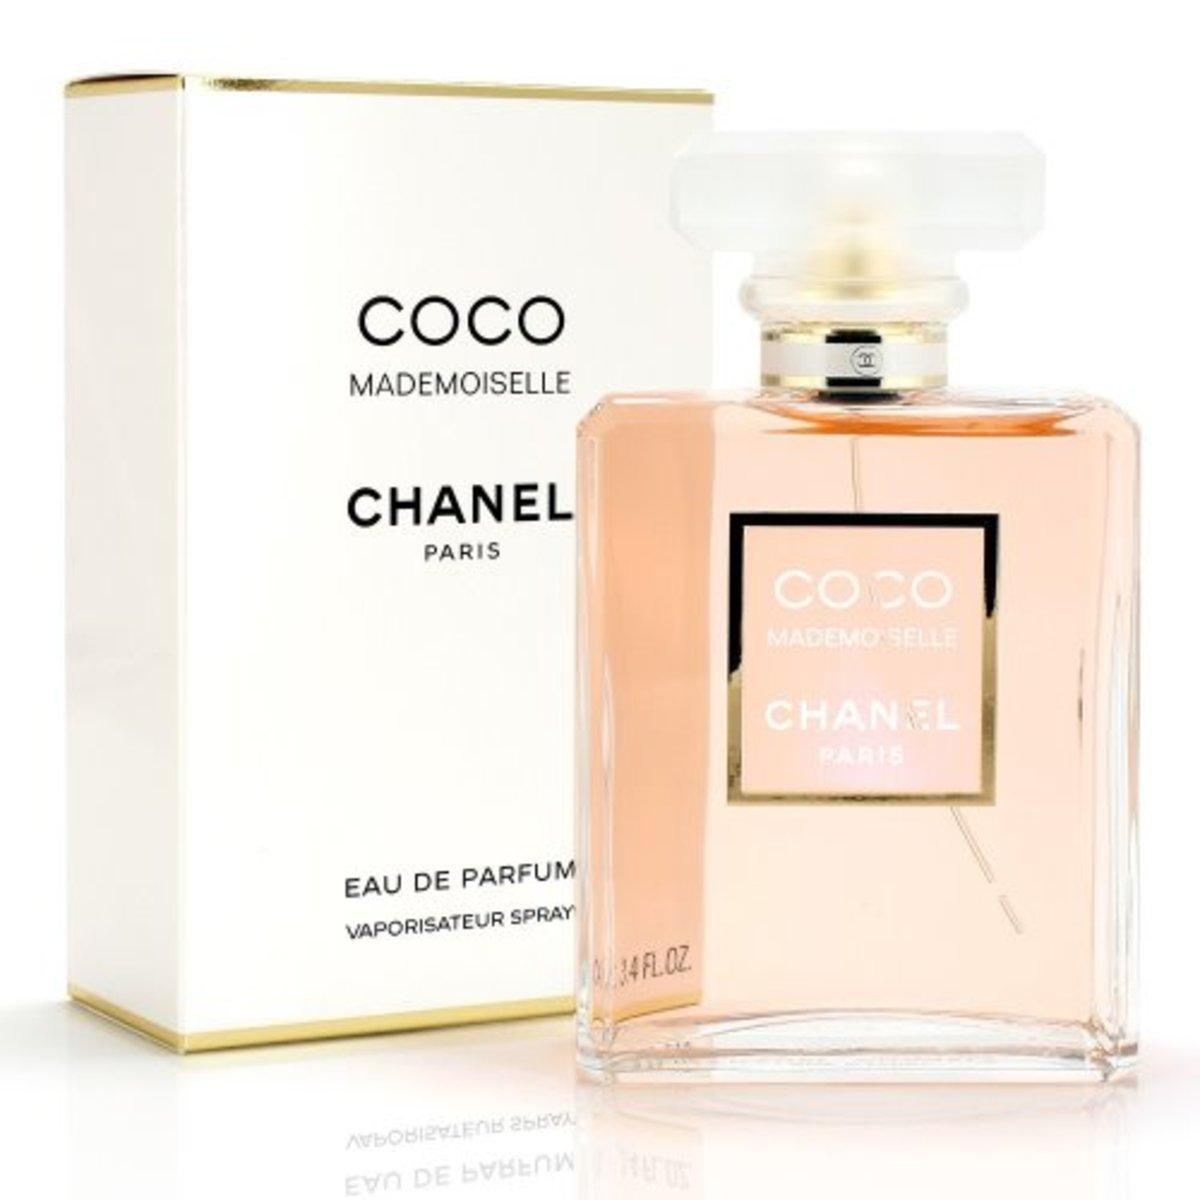 Coco Madamoiselle EDP 50ml [Parallel Import]